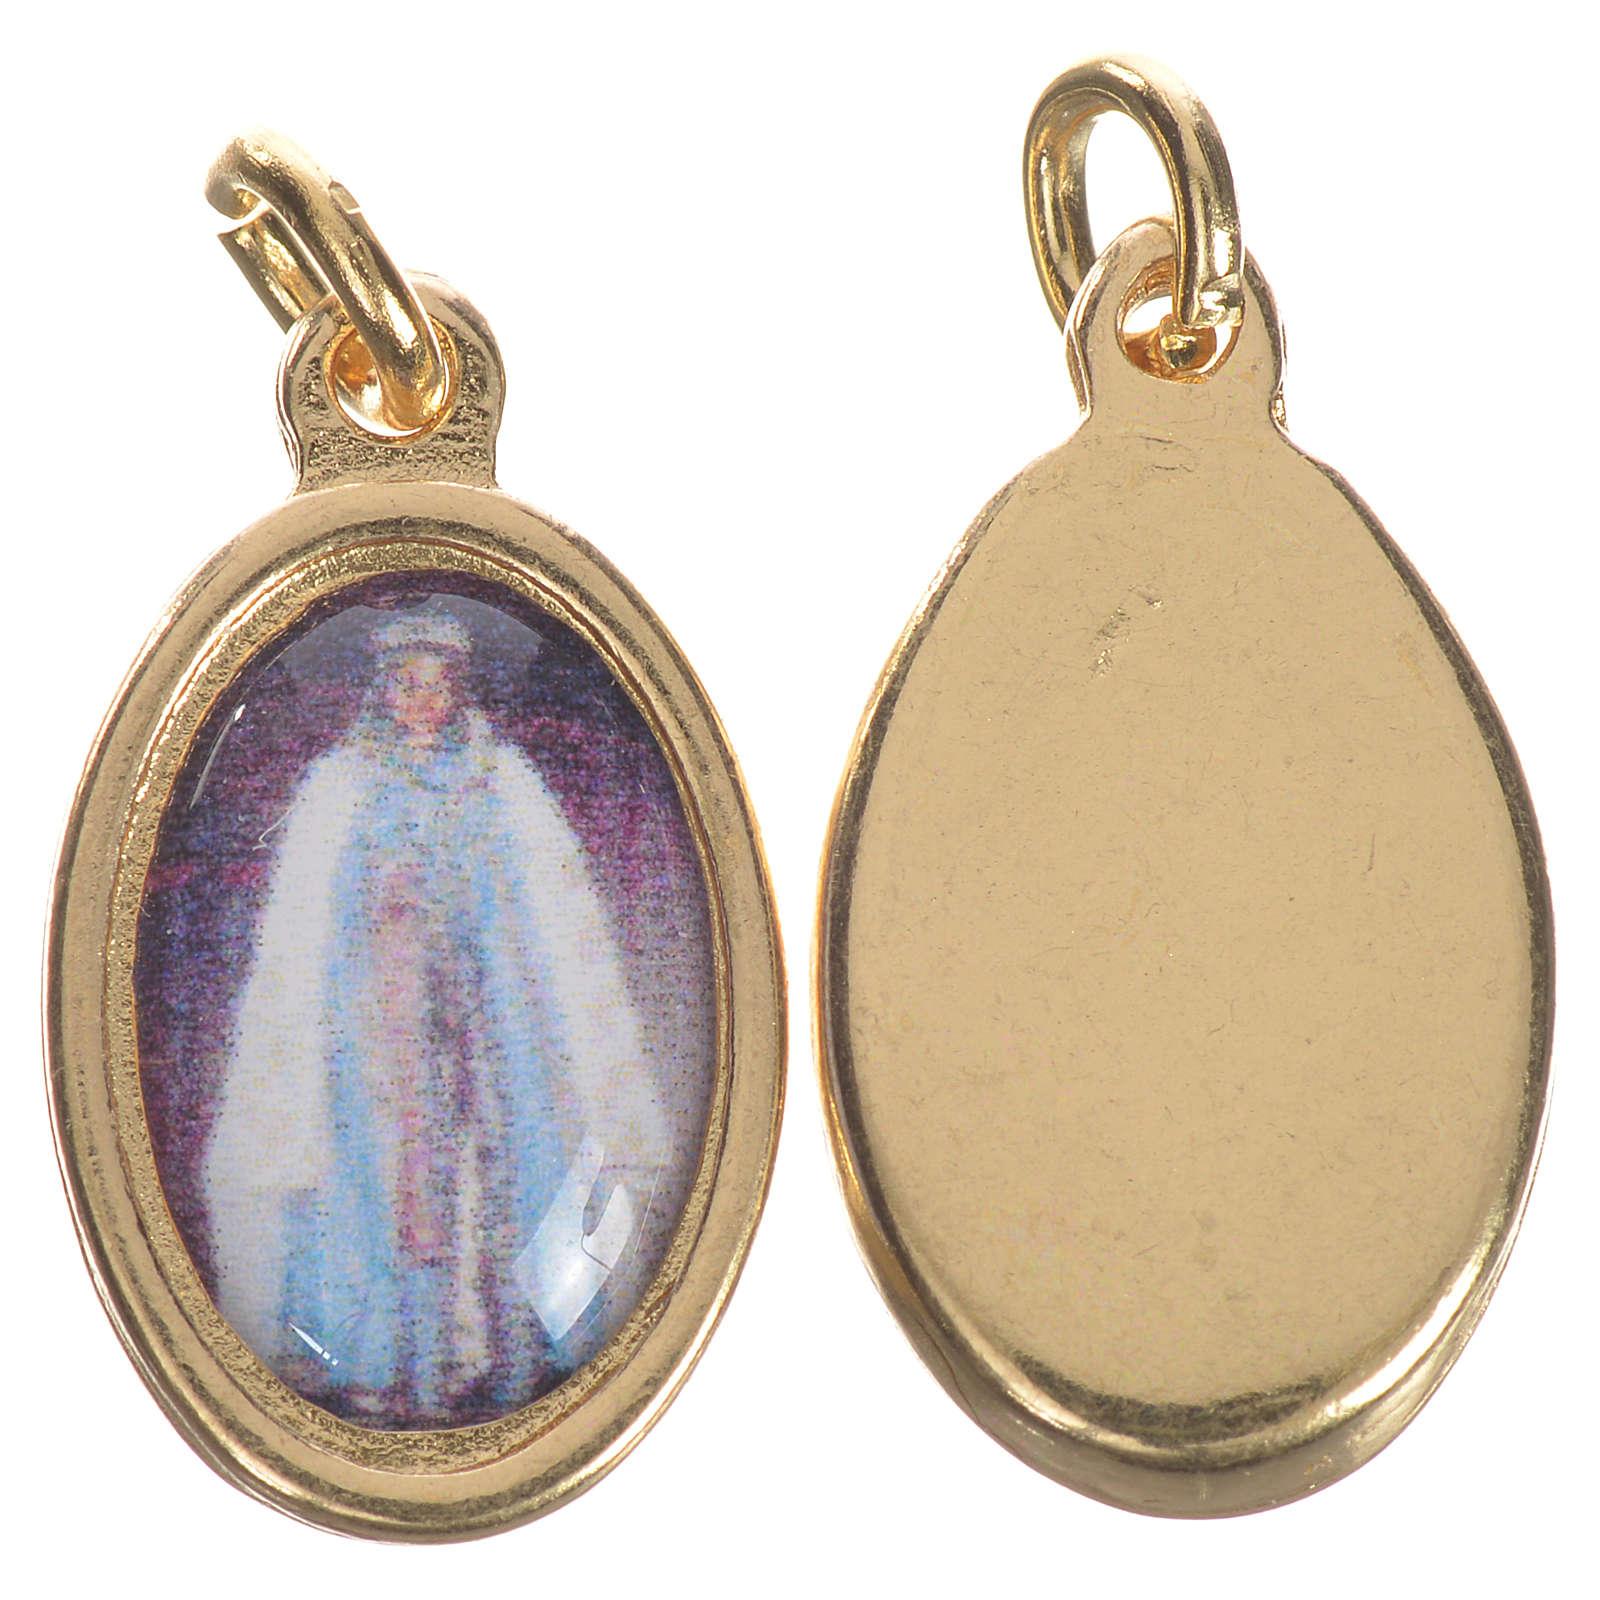 Saint Sarah Medal in golden metal, 1.5cm 4